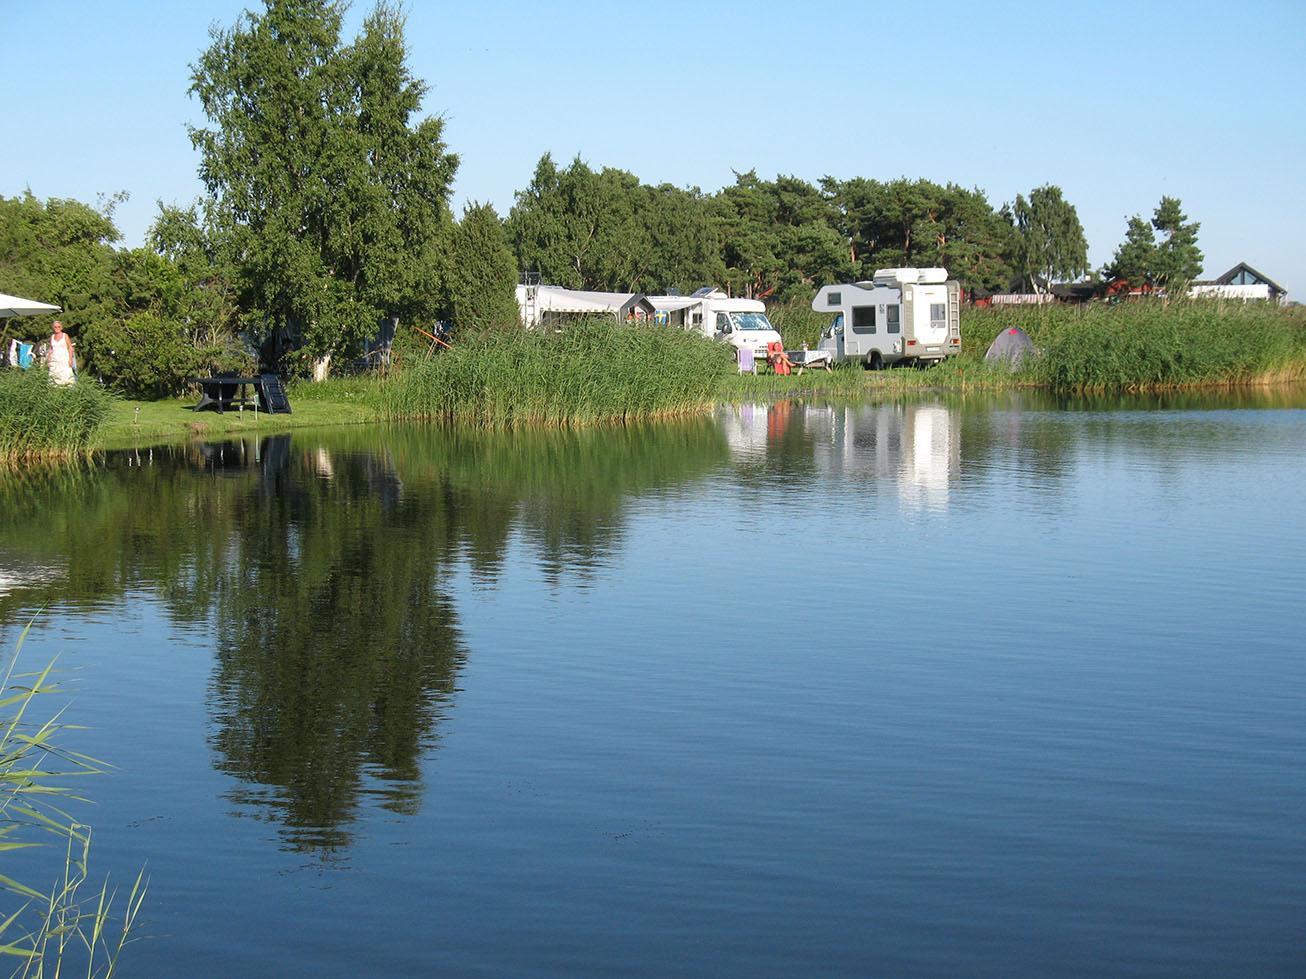 dalskars-camping-2aug-11-092